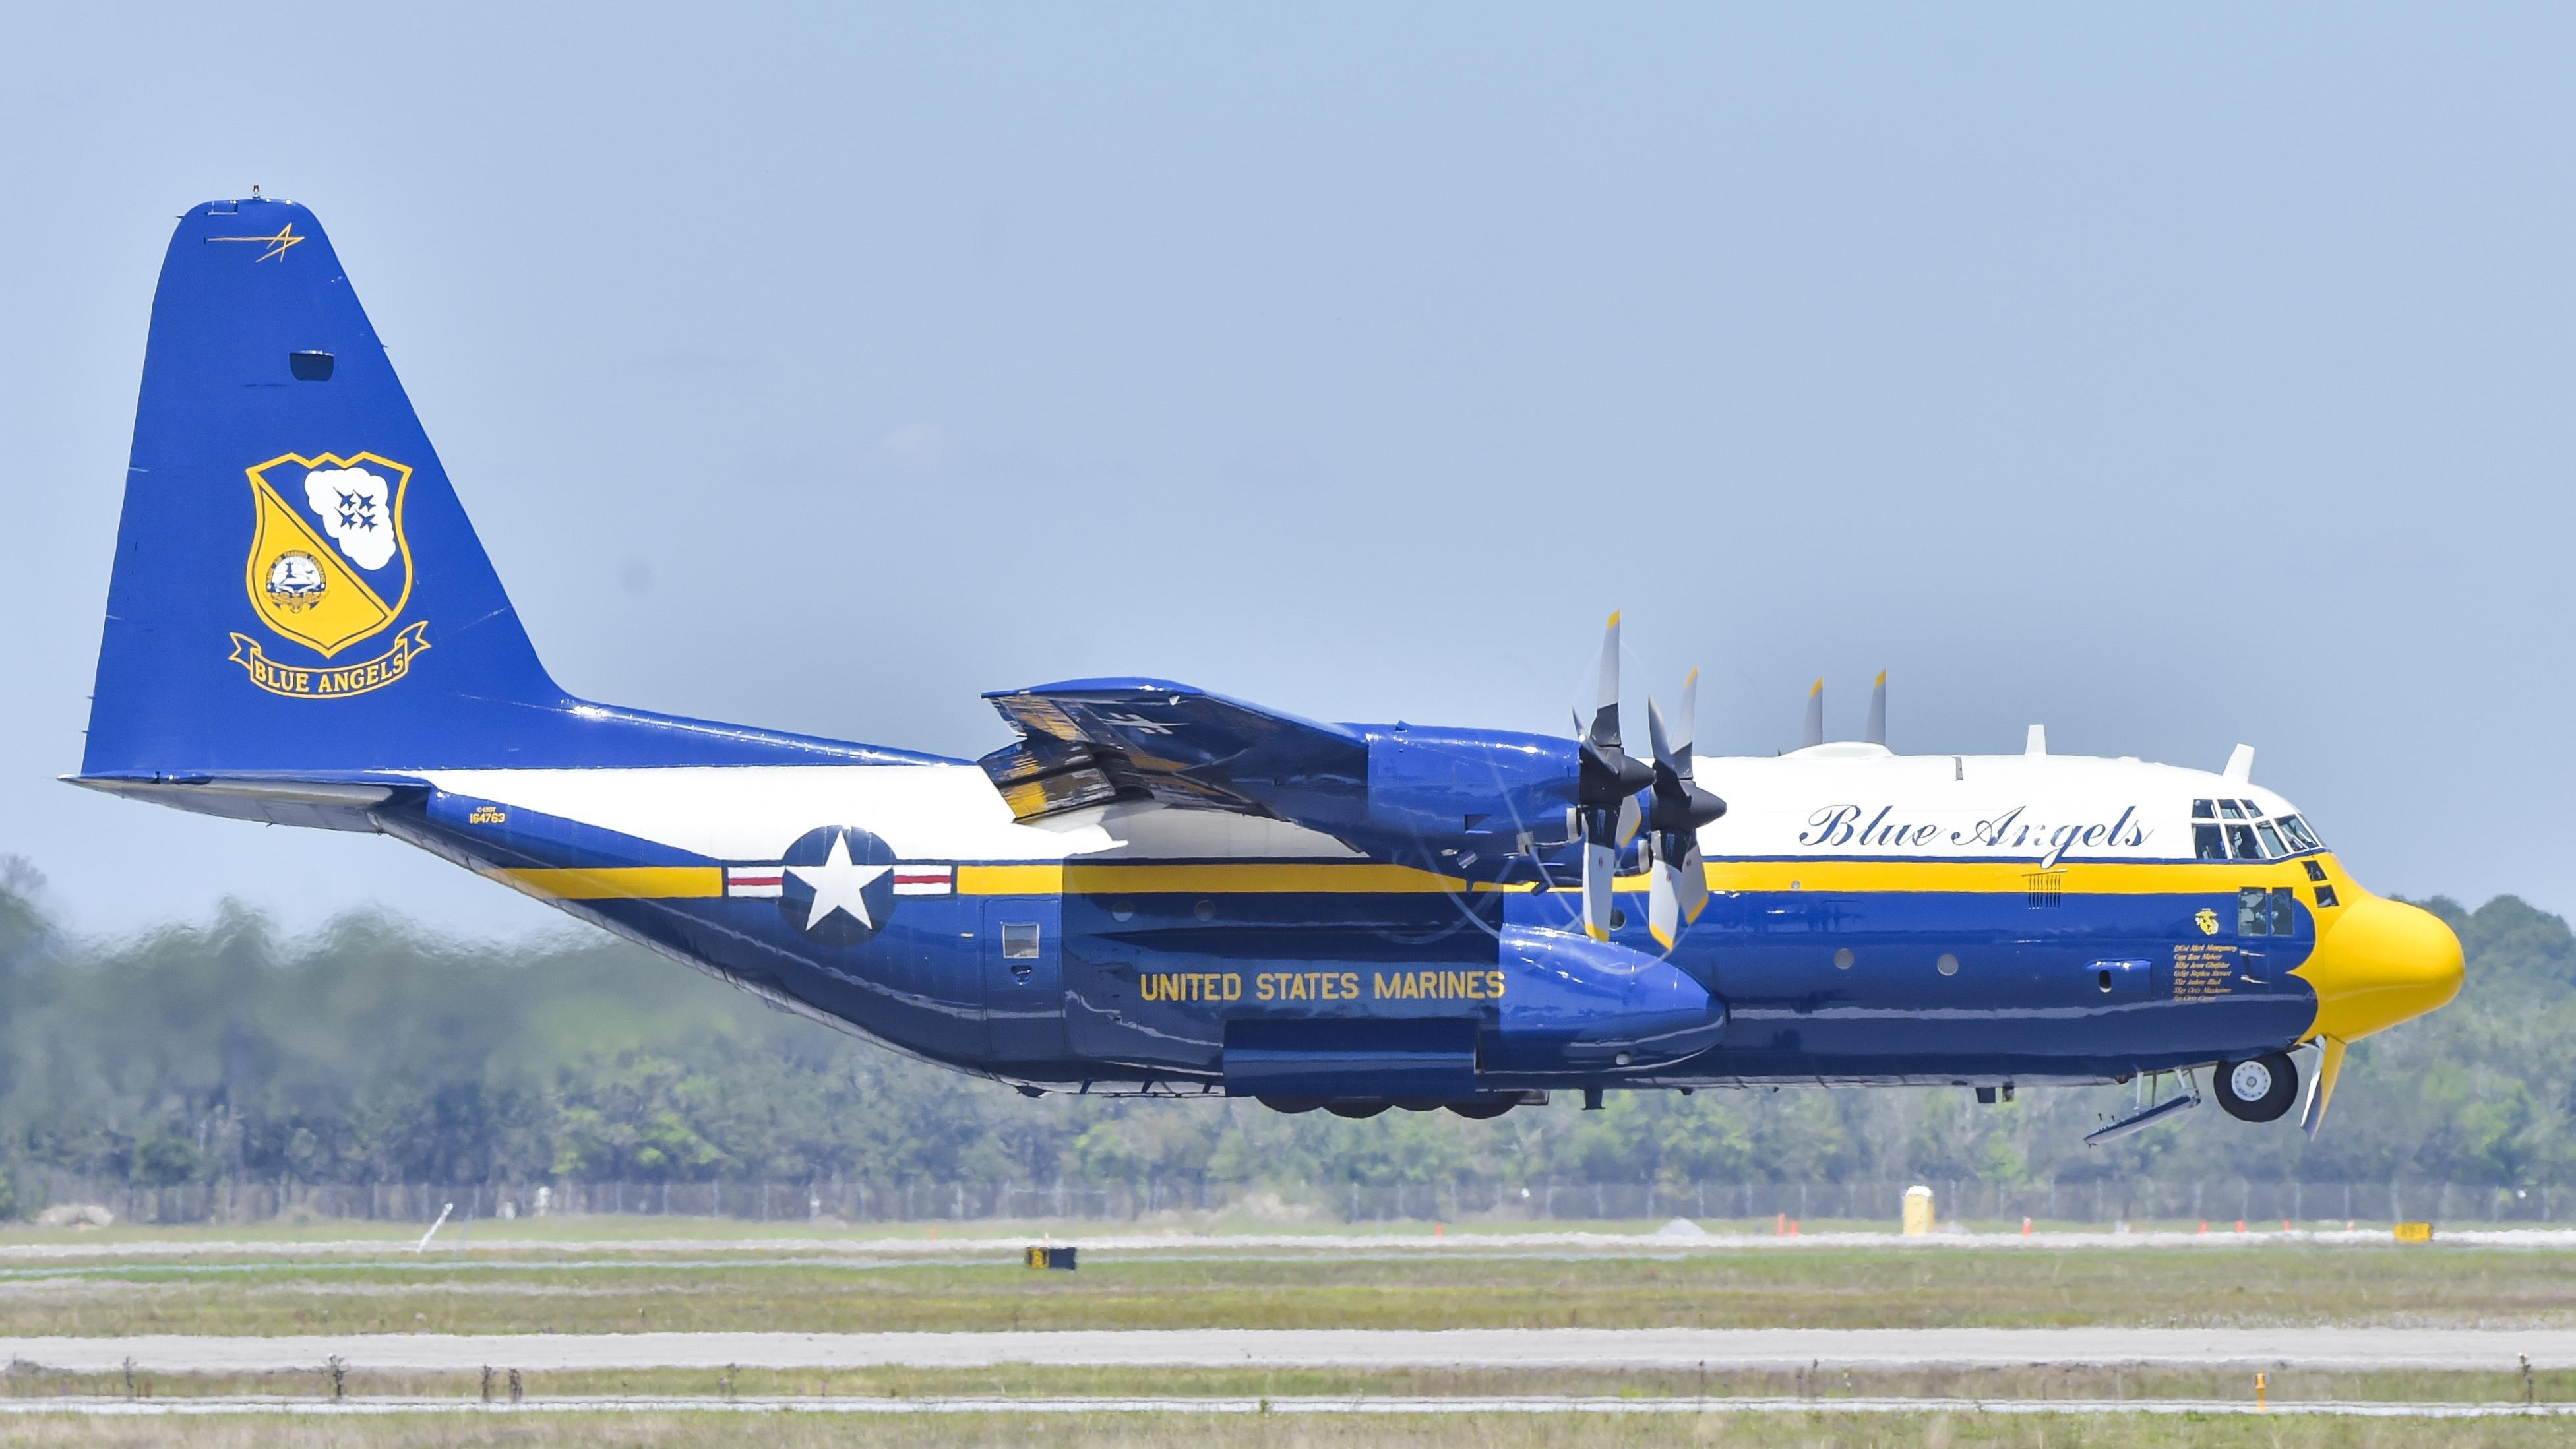 US Navy Blue Angels Fat Albert